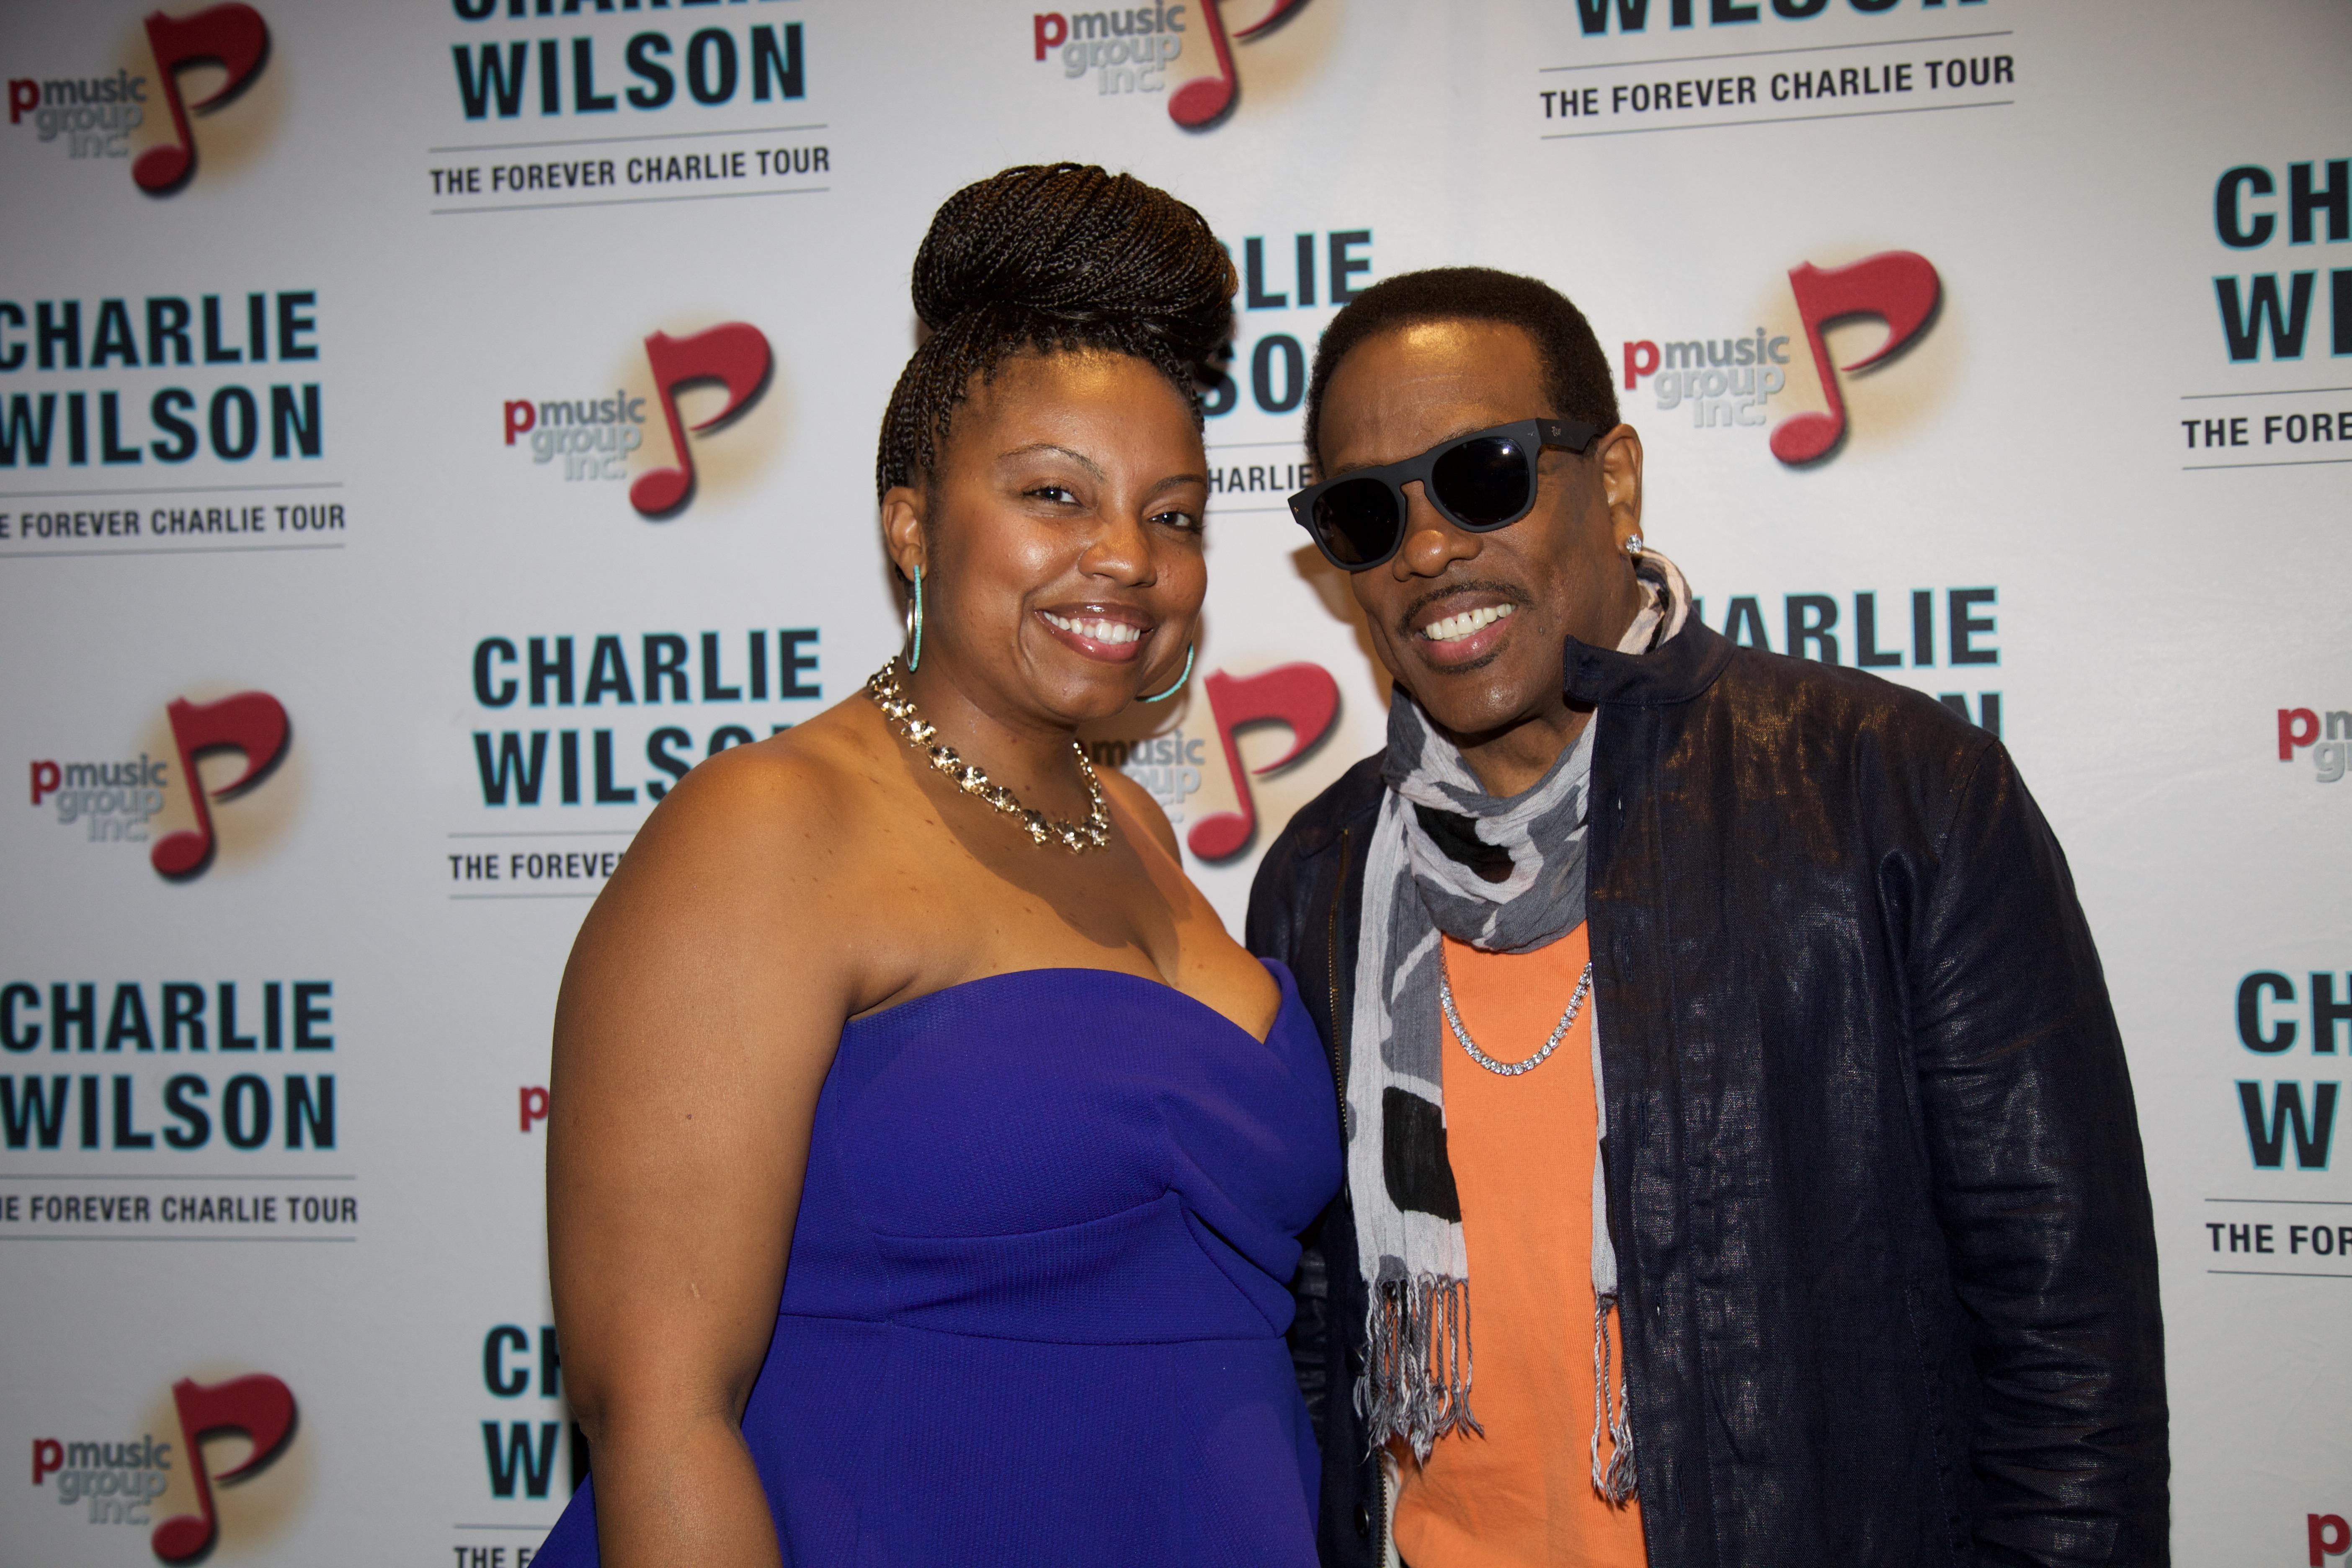 Charlie Wilson VIP's Meet & Greet